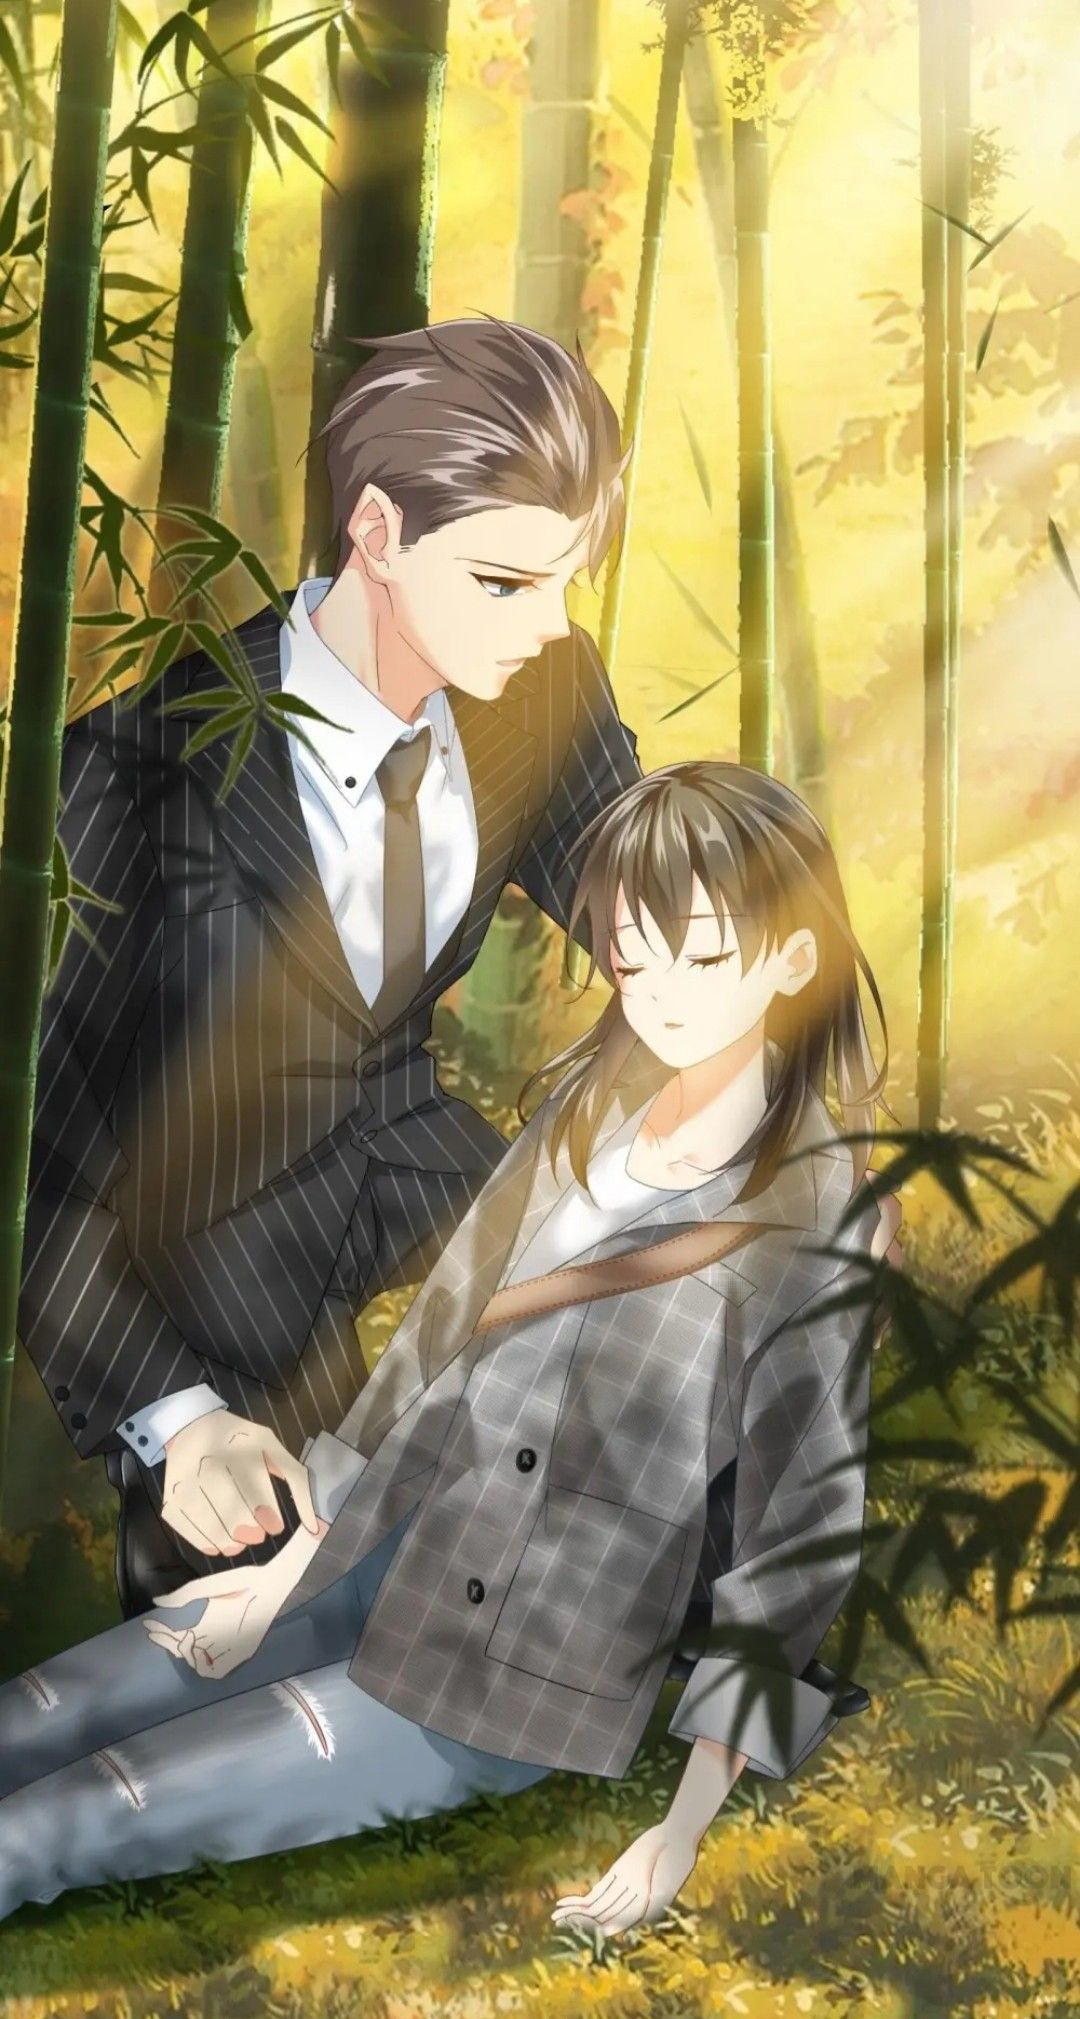 Ghim của Manga and anime trên Stream flow into dream trong